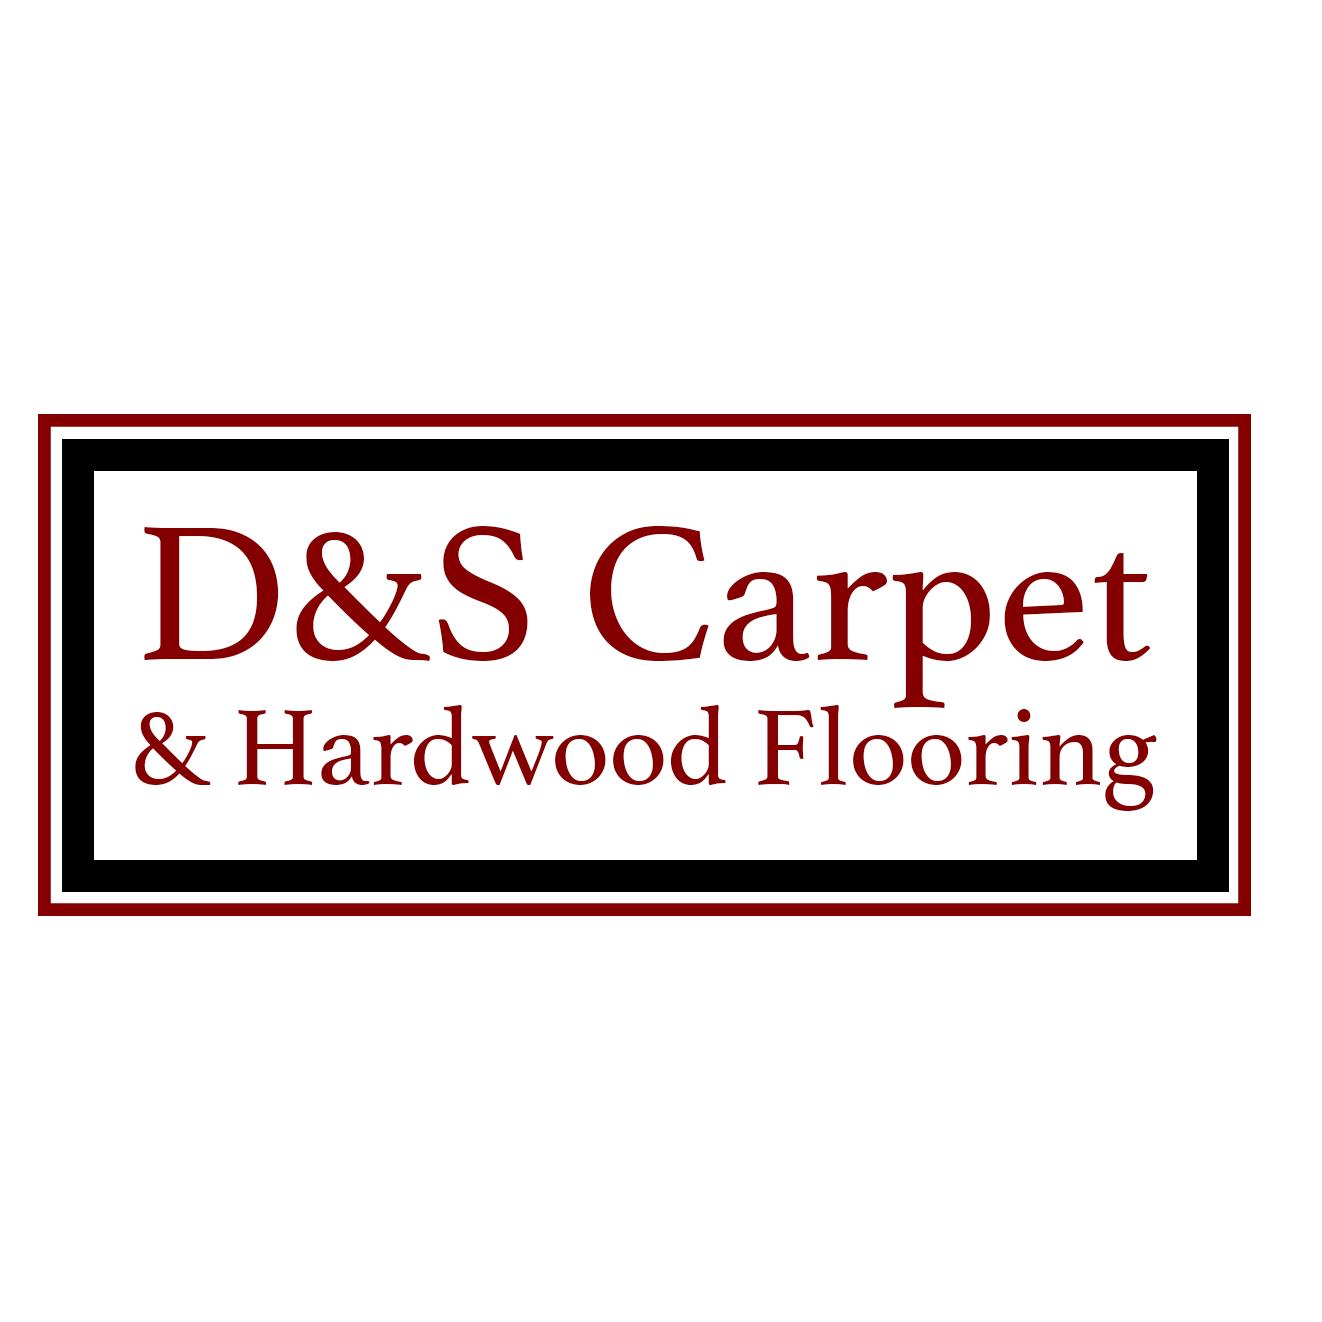 D&S Carpet & Hardwood Flooring image 0